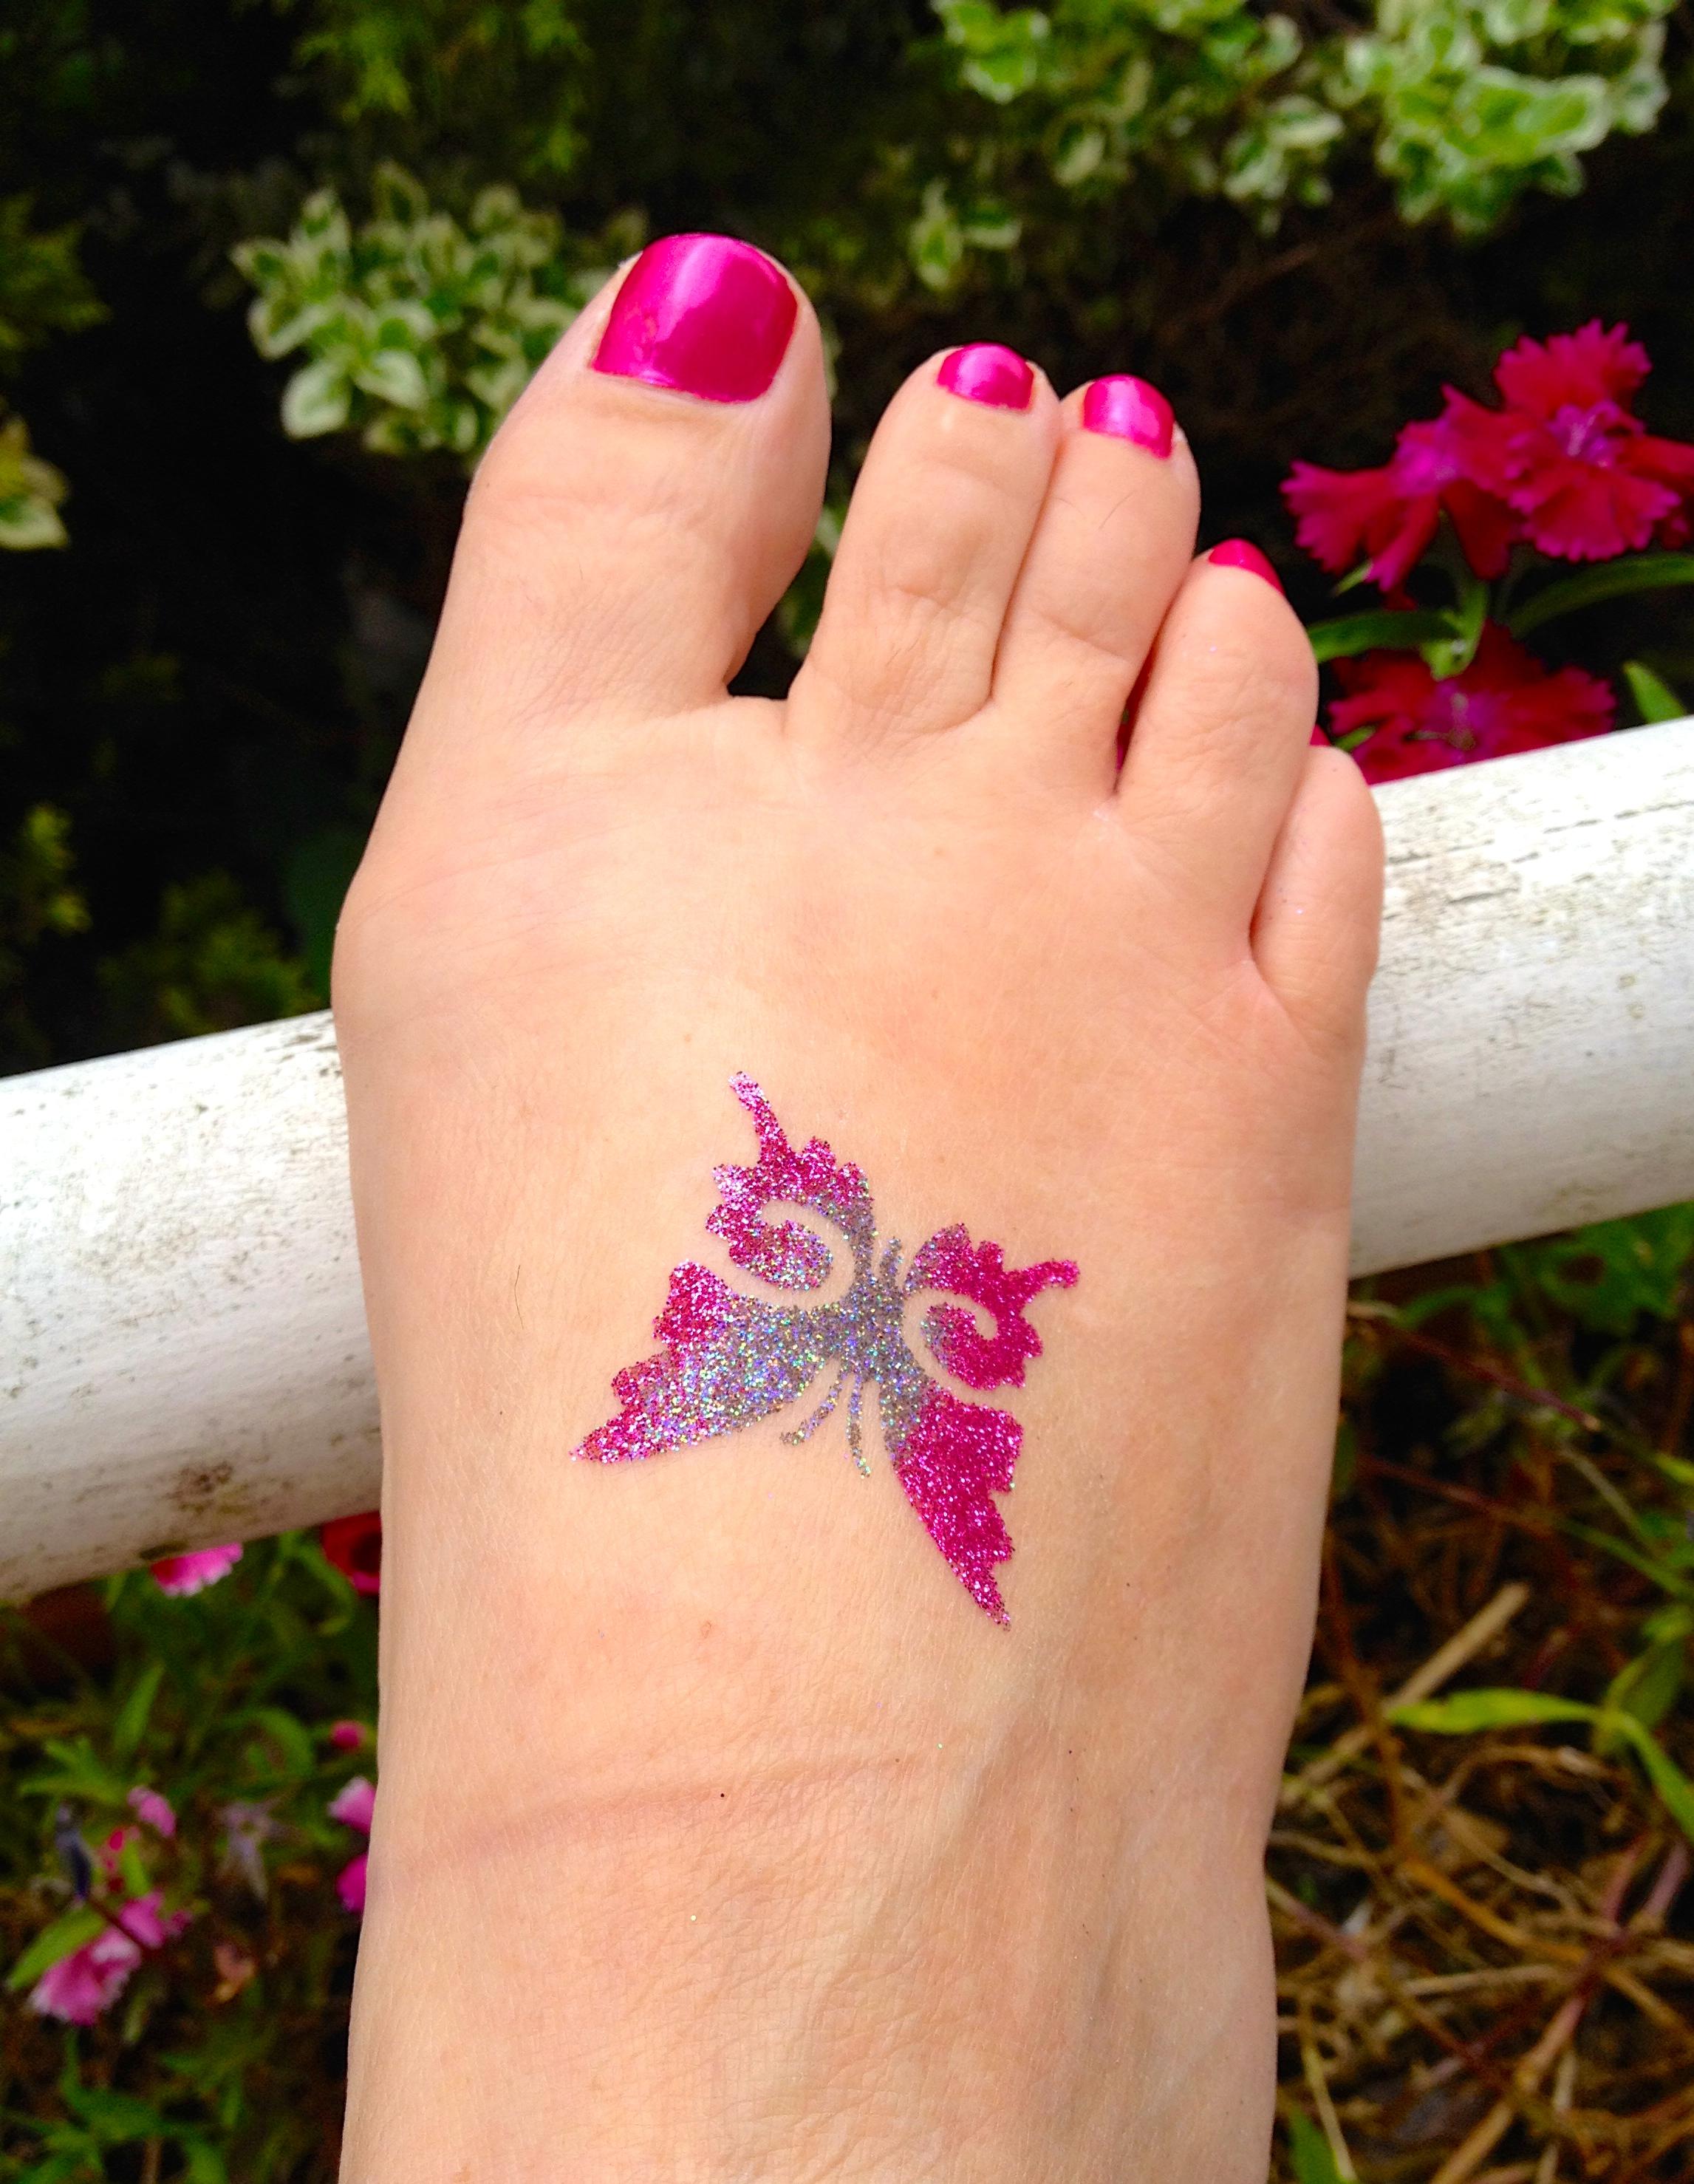 A glitter tattoo 'selfie'!